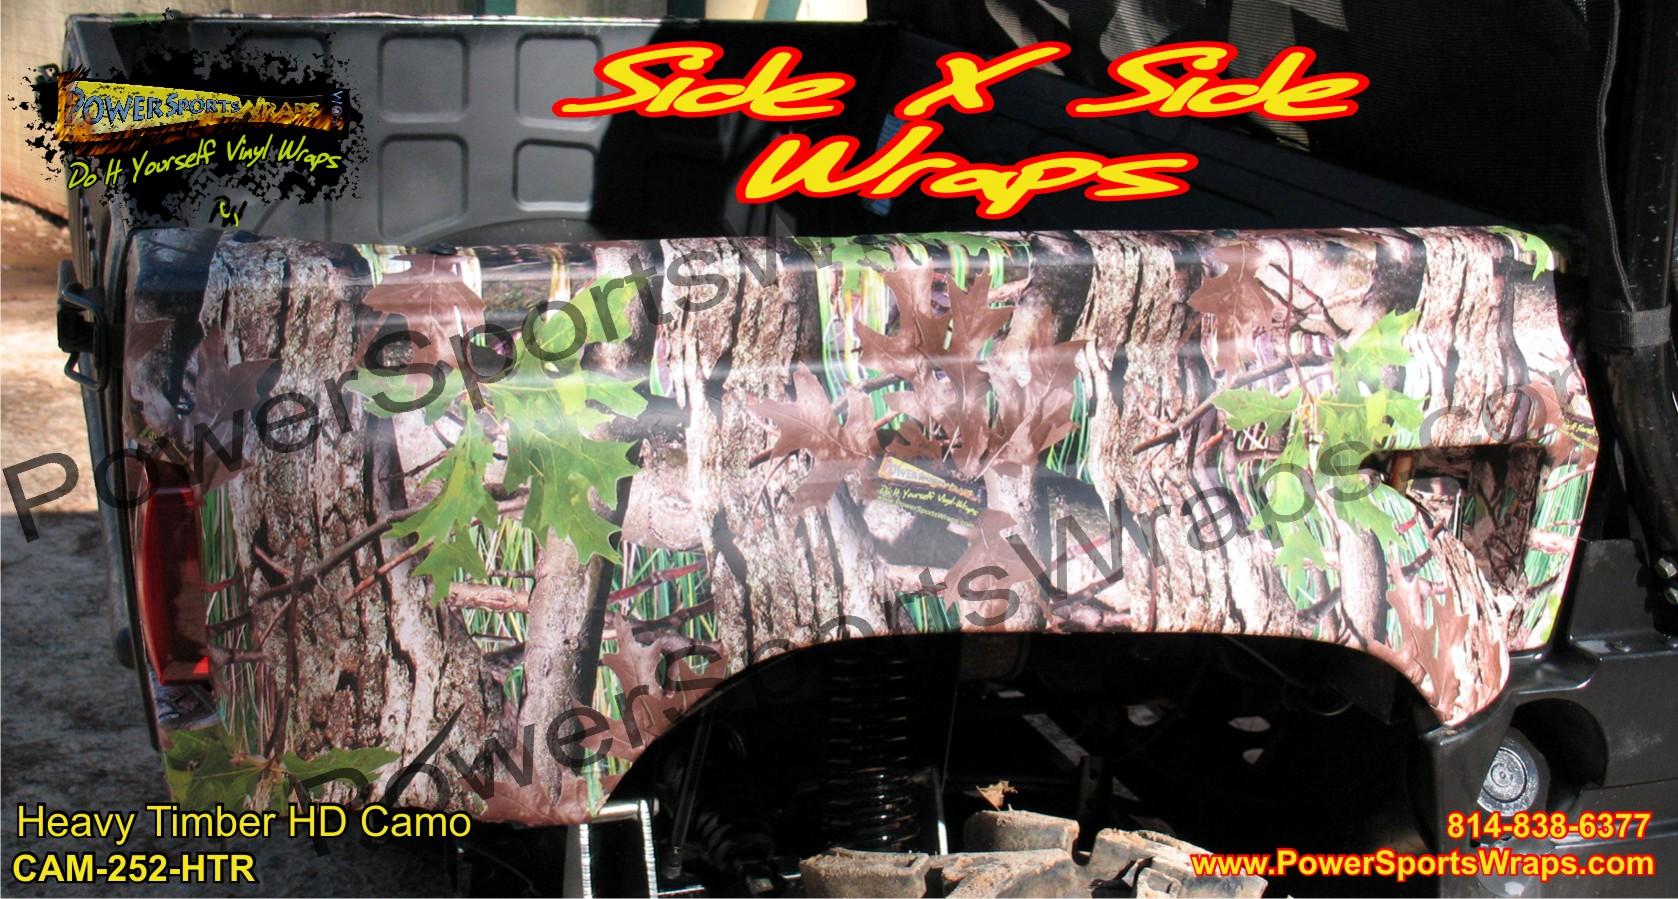 Rhino camo vinyl, Yamaha, camo decals, tree camo, side x side, utv camo 814-838-6377